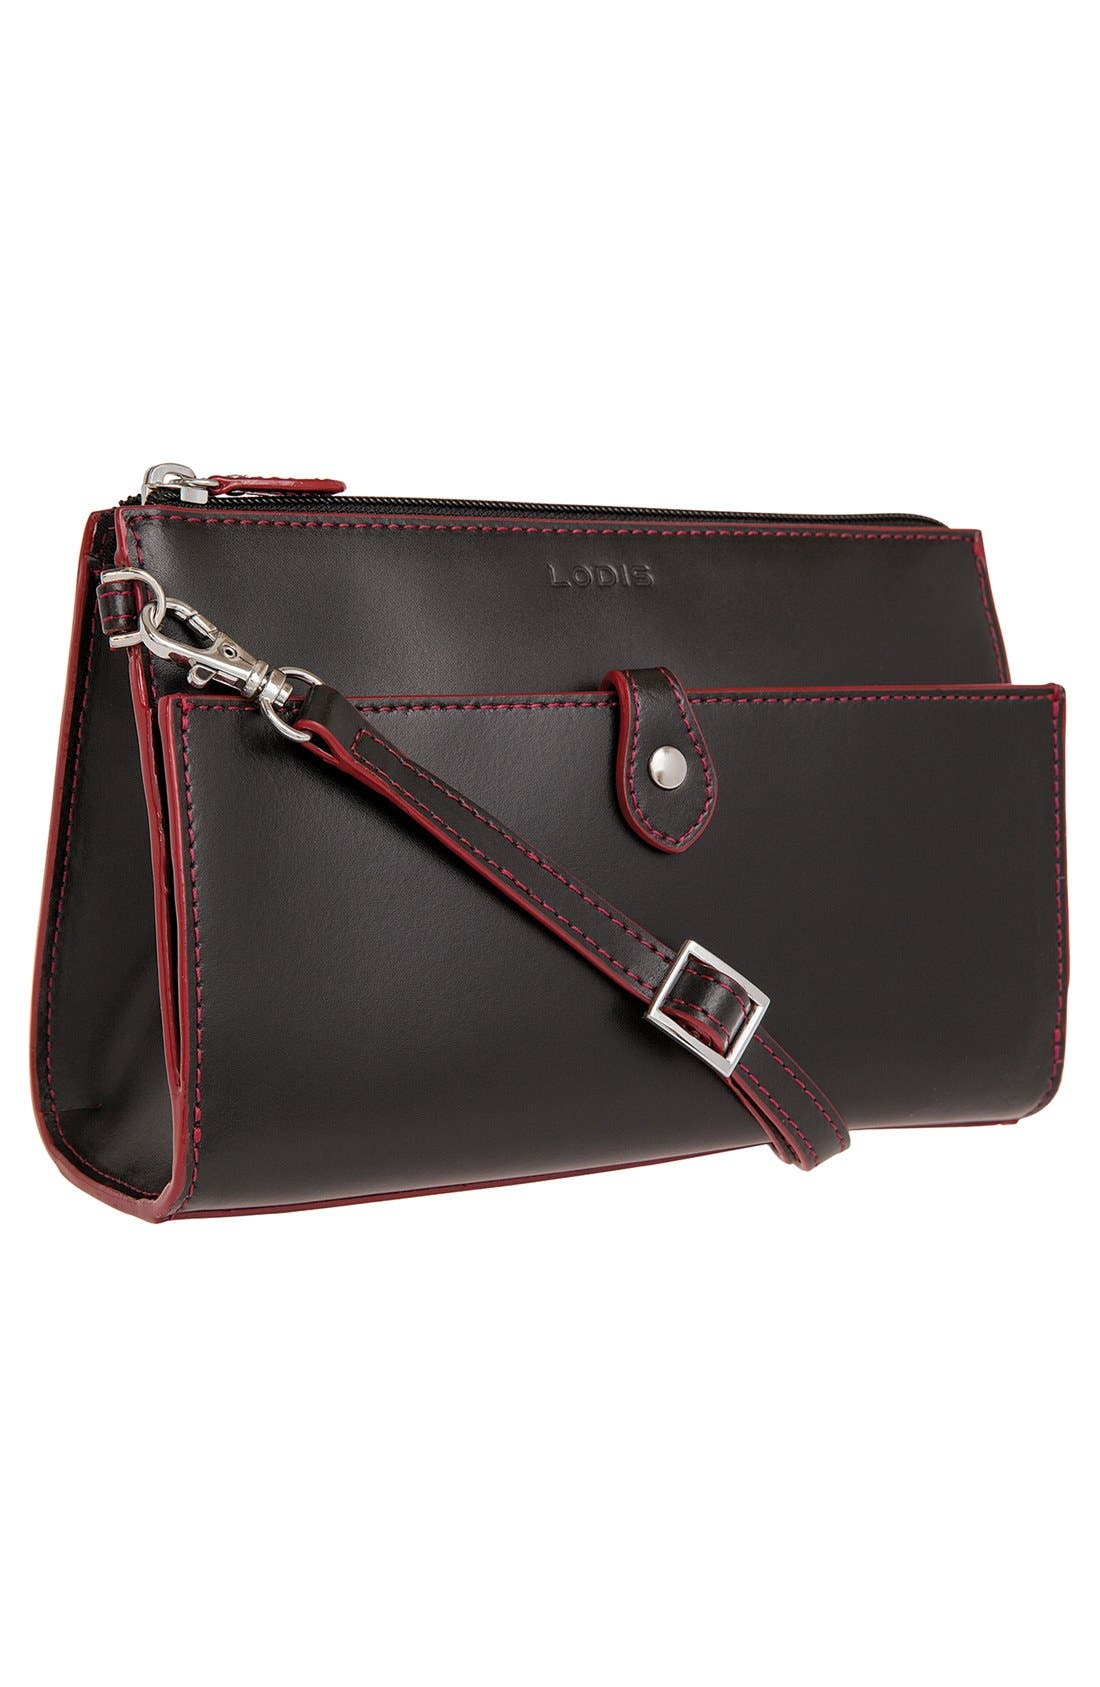 Lodis'Audrey Collection -Vicky' ConvertibleCrossbody Bag,                             Alternate thumbnail 3, color,                             001